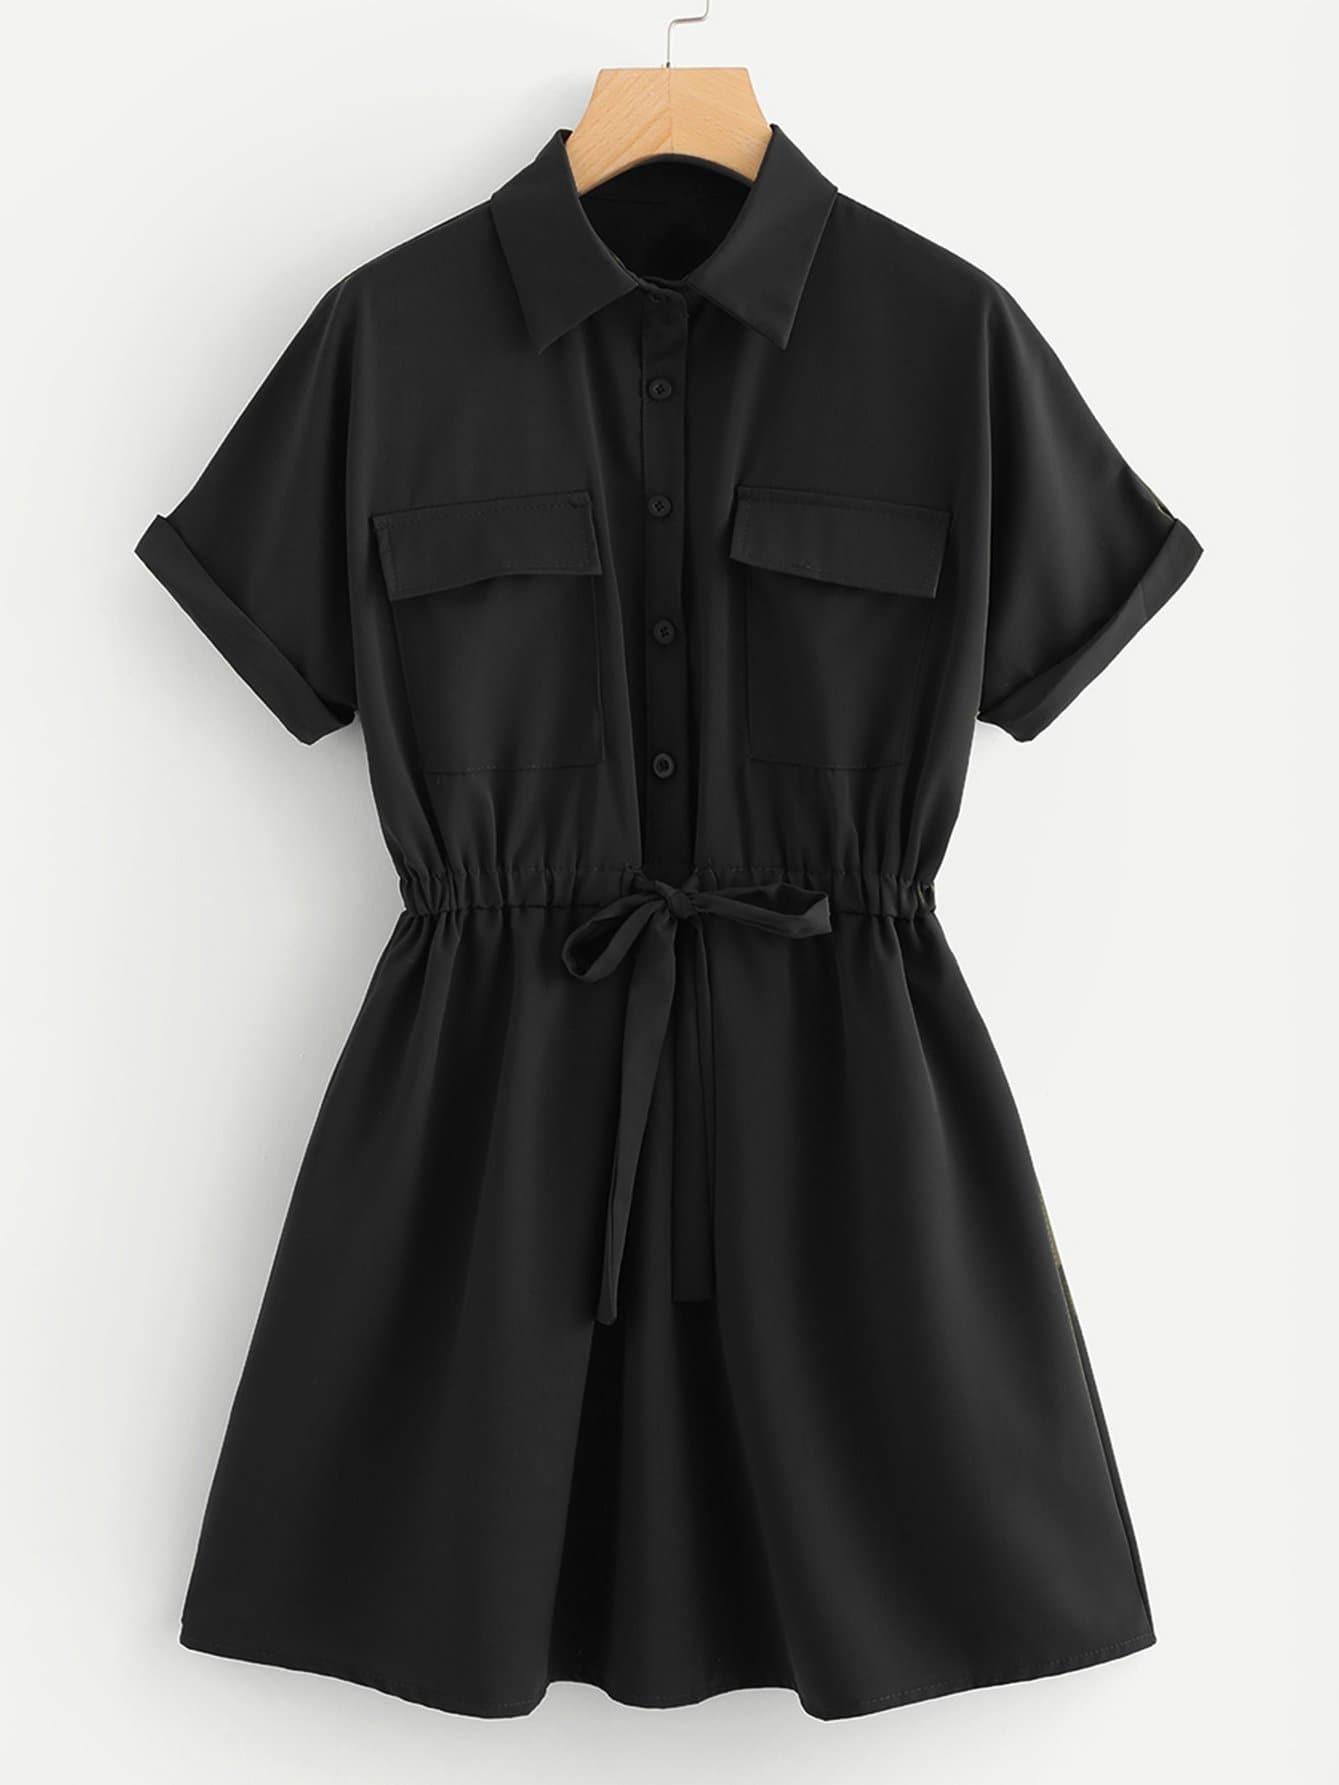 Drawstring Waist Shirt Dress drawstring waist tank dress